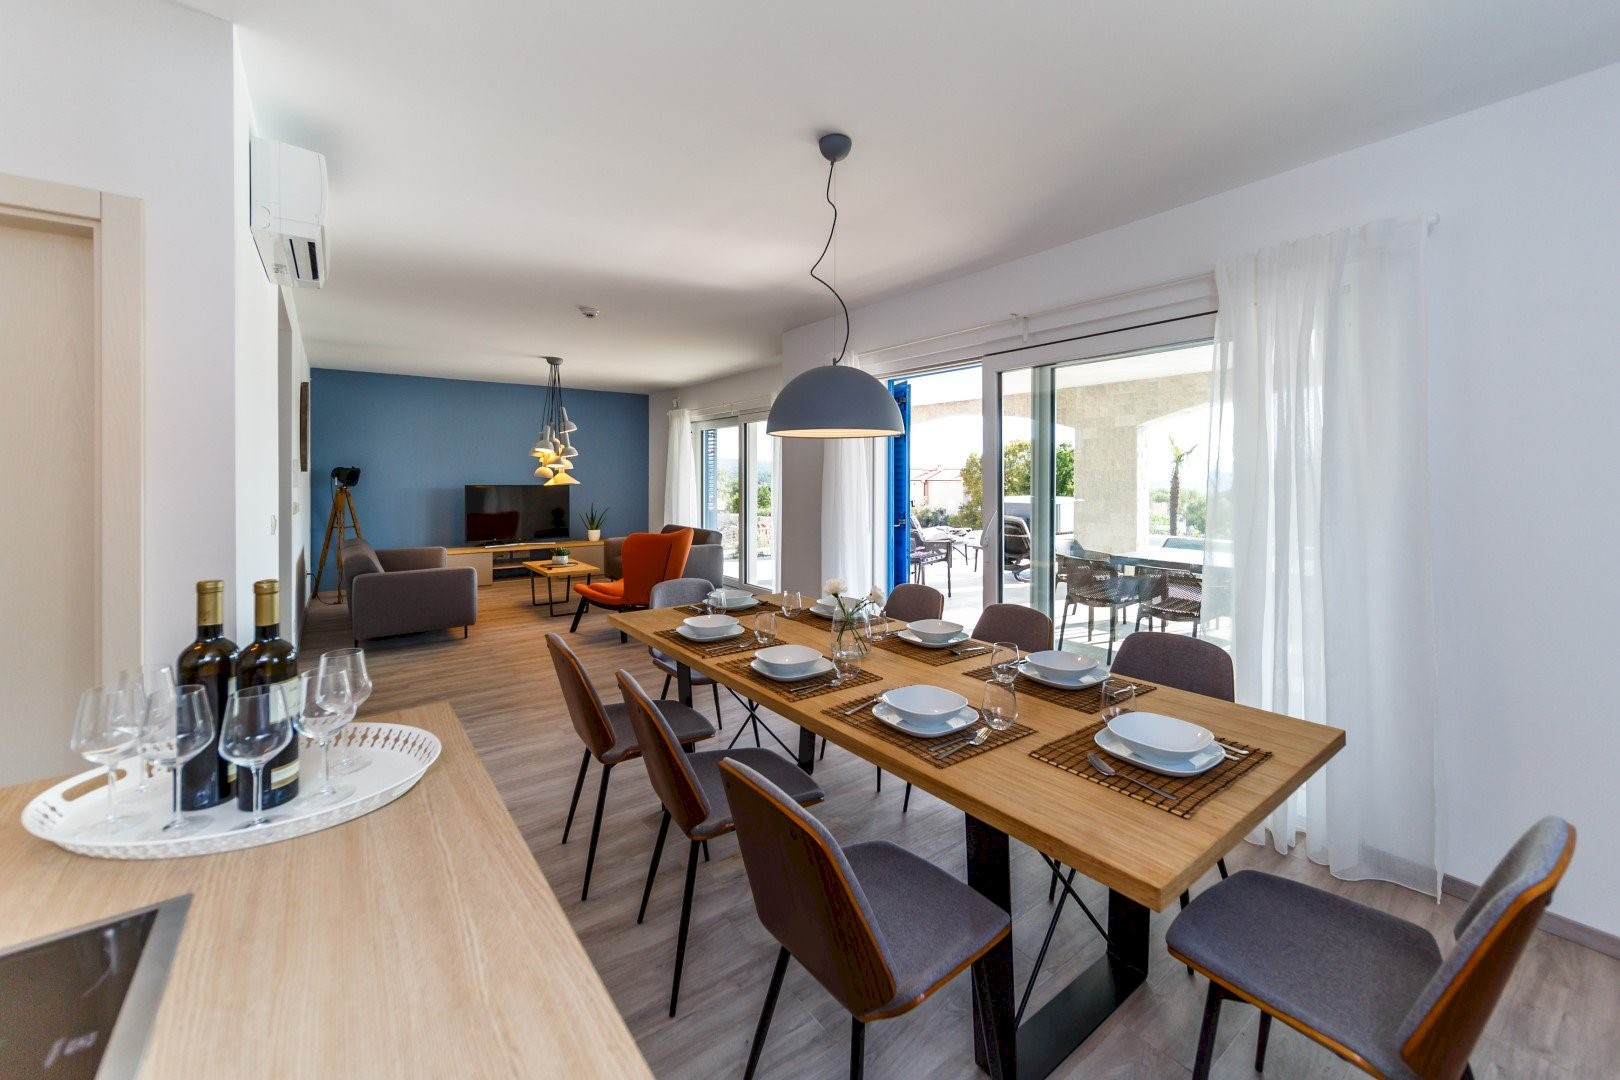 Ferienhaus Luxury Villa Loma 2 (2586643), Sveti Vid-Miholjice, Insel Krk, Kvarner, Kroatien, Bild 7